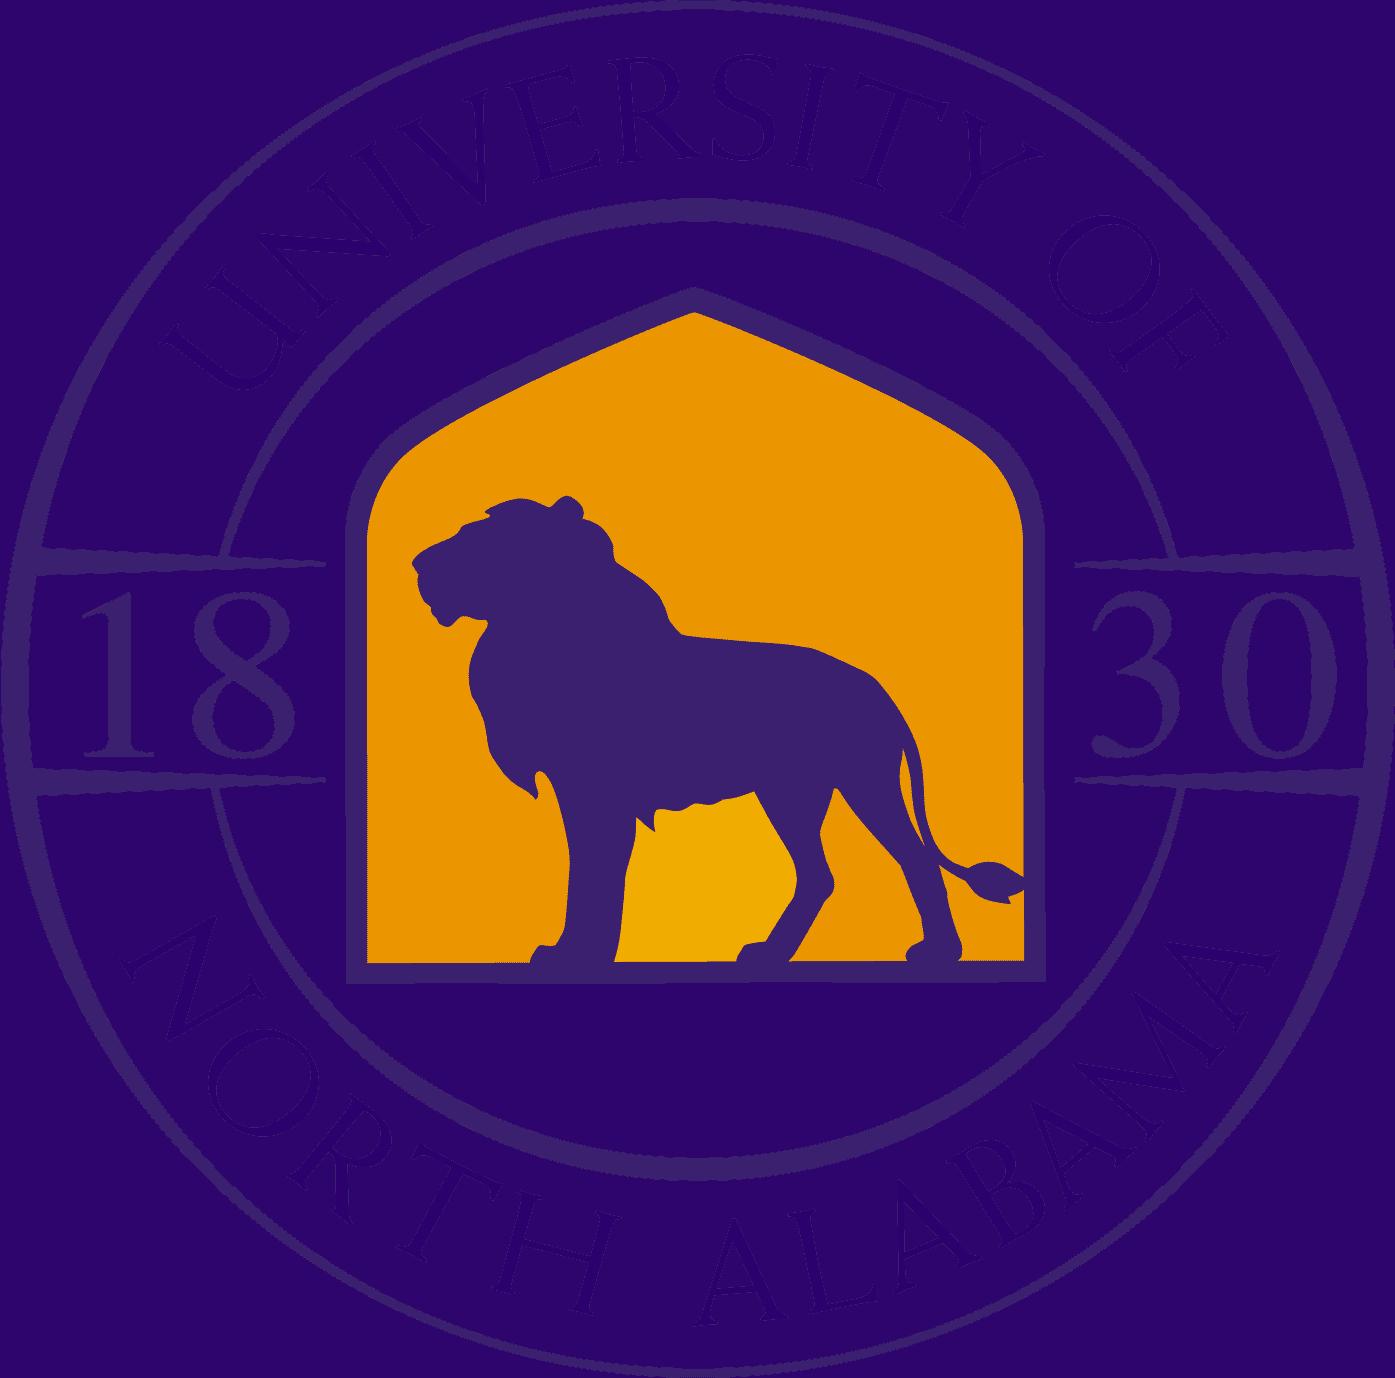 University of North Alabama Logo (UNA) png